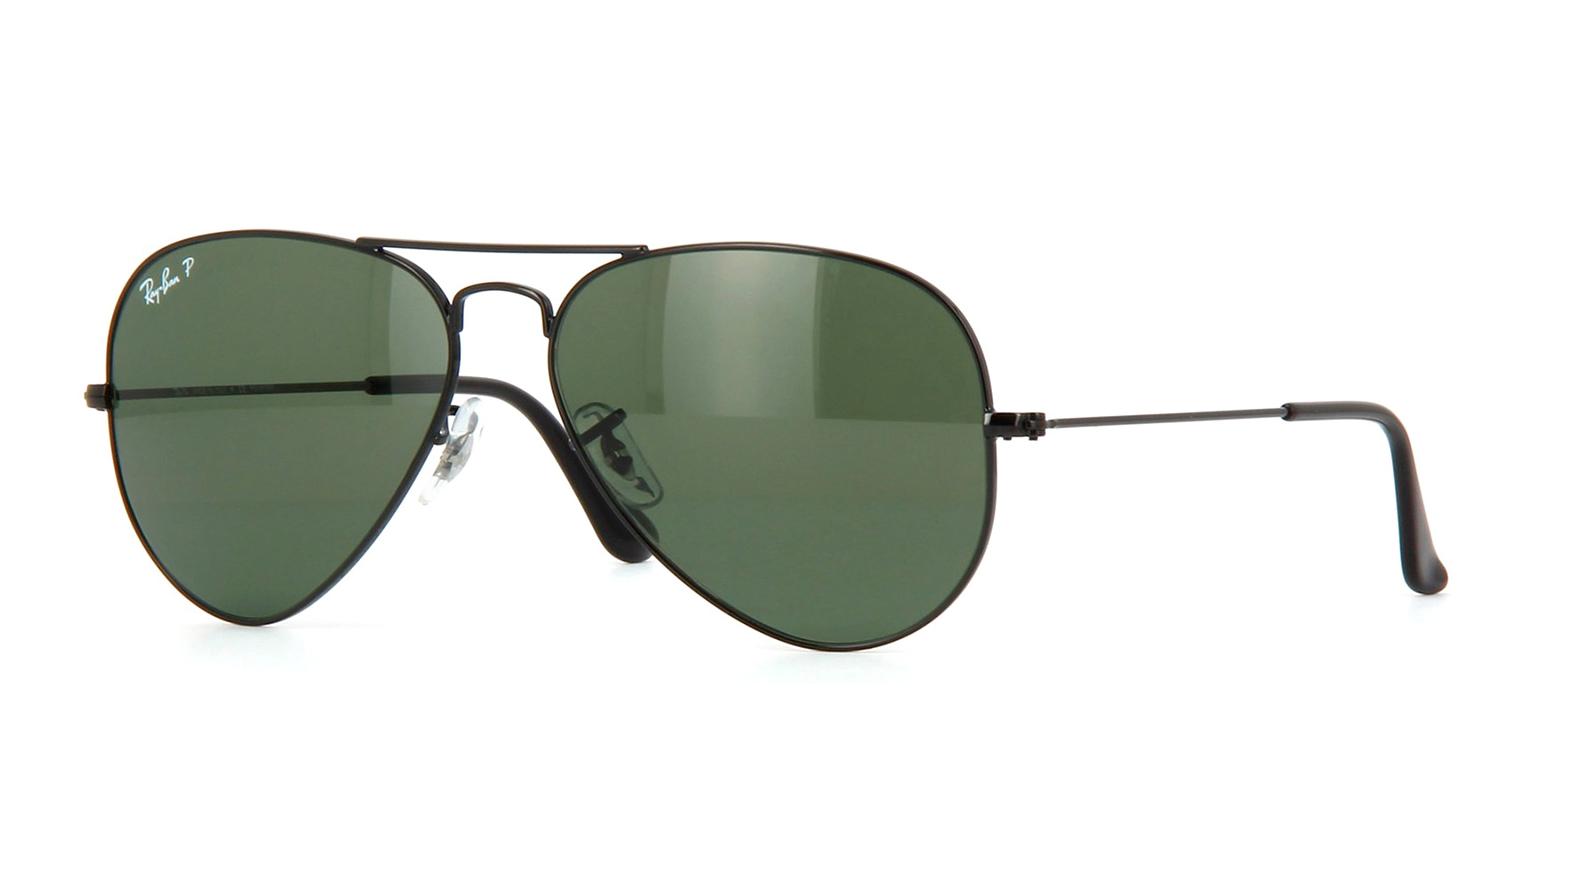 d75a5ec0e Ray-Ban RB3025 002/58 Aviator Classic Black Sunglasses for sale ...